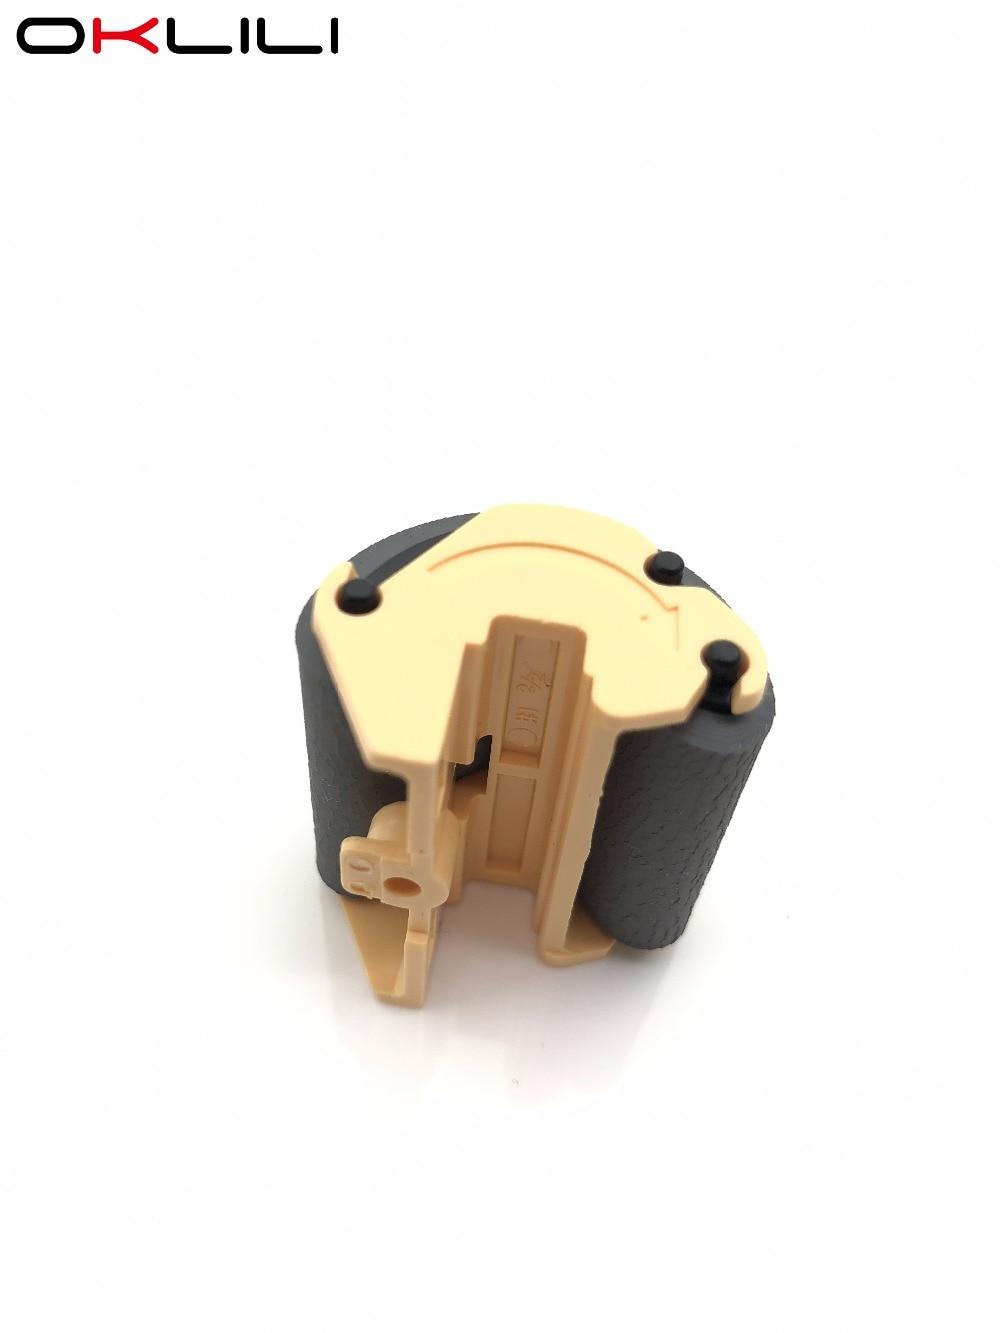 ORIGINAL NEW JC93-00087A Pickup Roller for Samsung ML1910 ML1913 ML1915 ML2525 ML2540 ML2545 ML2580 ML2850 SF650 SCX4600 SCX4623 3pieces lot free shipping toner cartridge chip for samsung mlt d1053s 1053l 1052 ml 1910 1911 1915 2525w 2526 2580 scx 4600